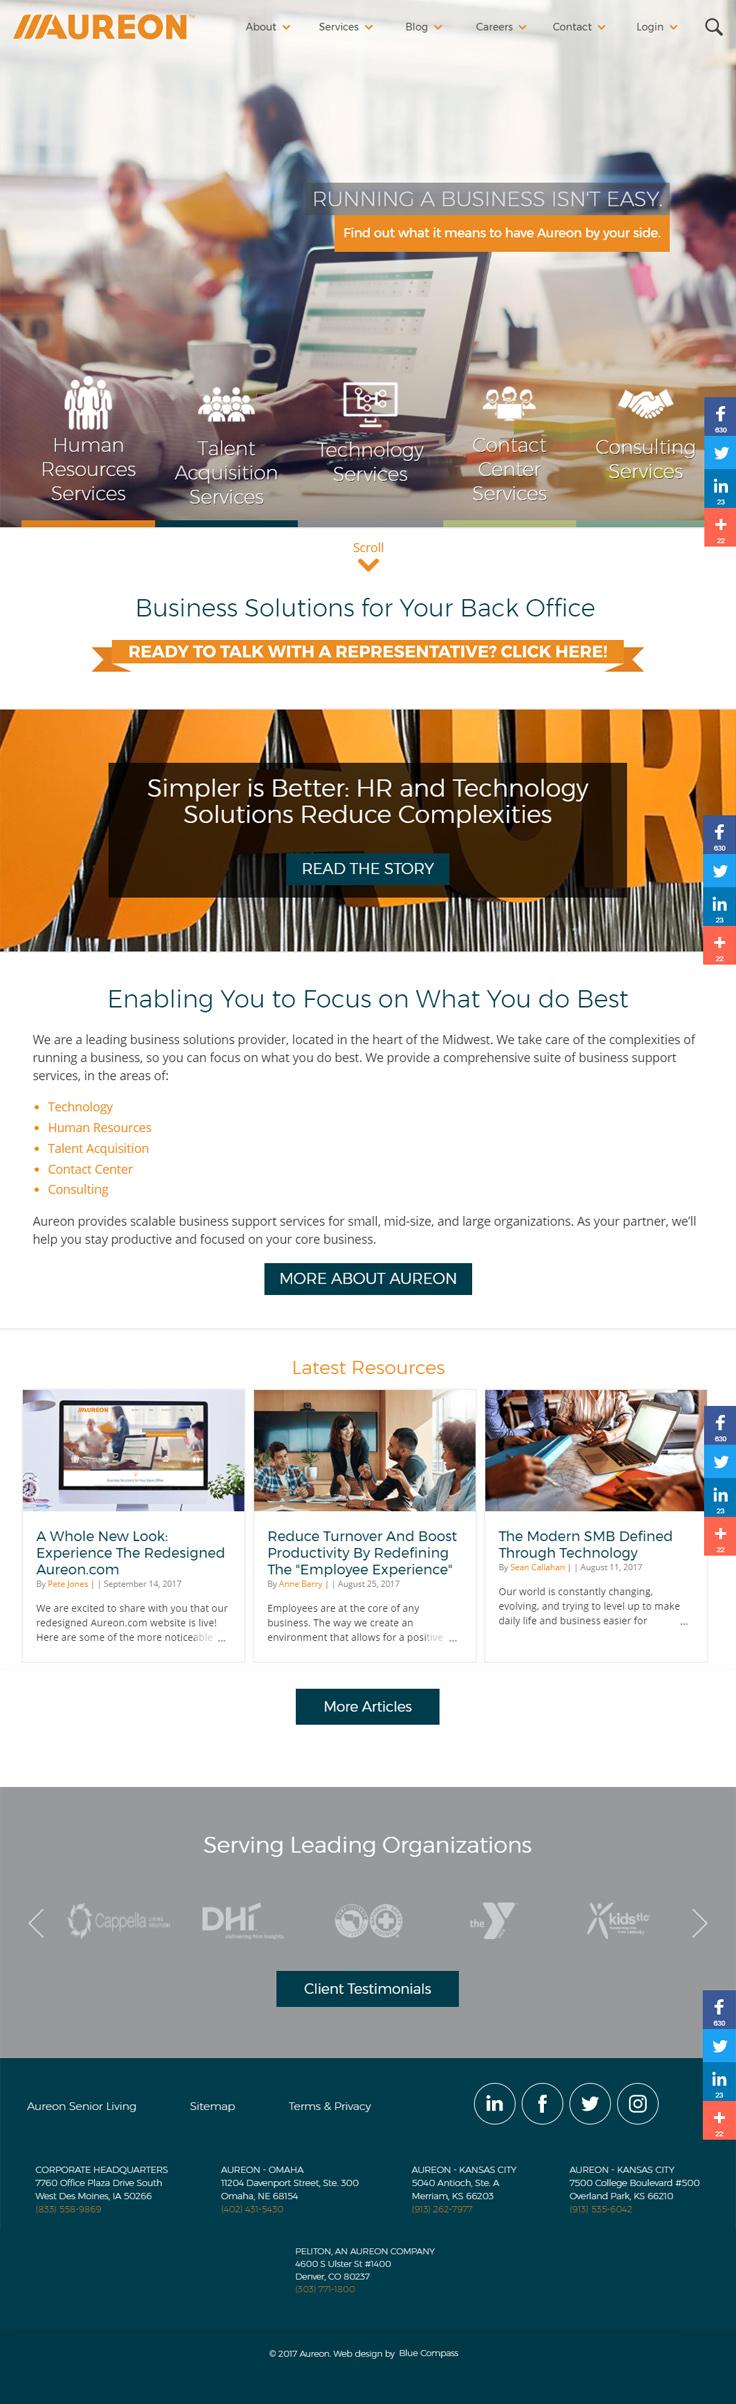 Aureon S New User Friendly Web Design Technology Solutions Blue Compass Web Design